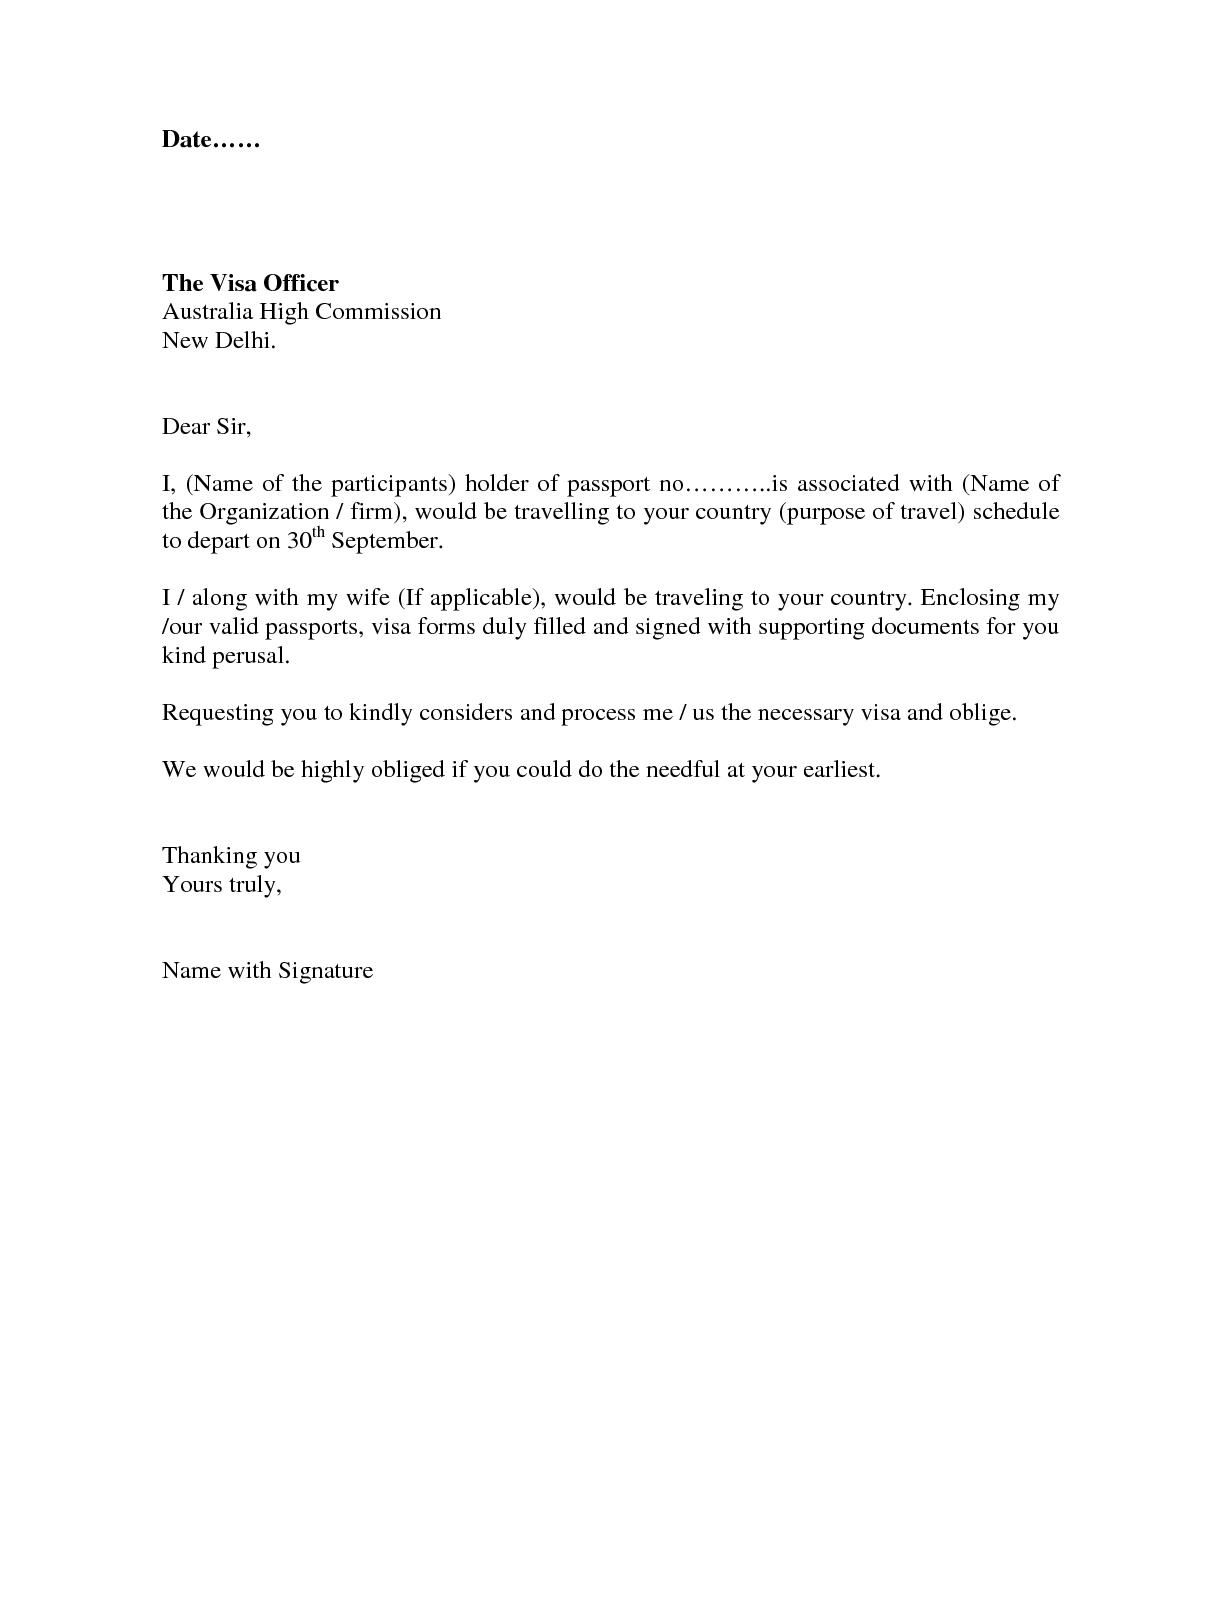 Nanny Reference Letter New Zealand